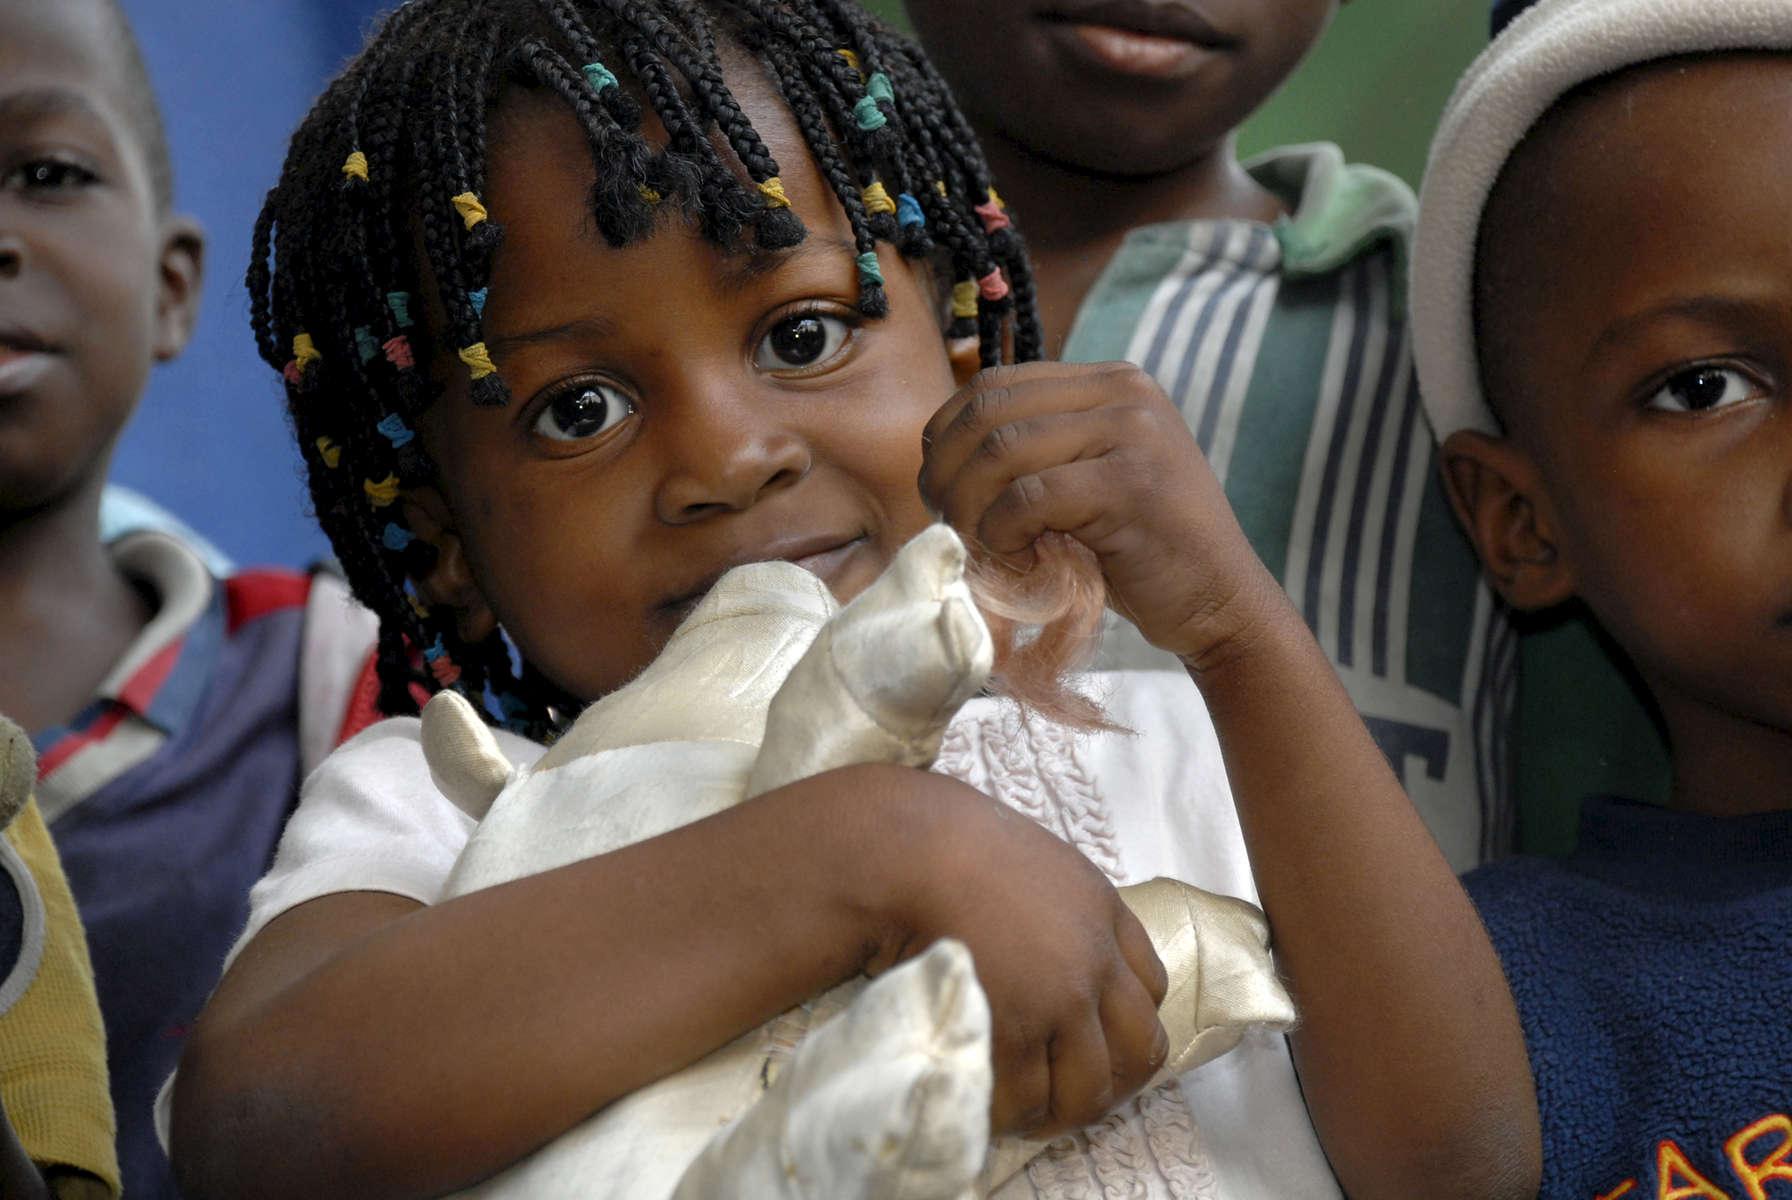 Orphanage in Kinshasa, DRCongo 2009